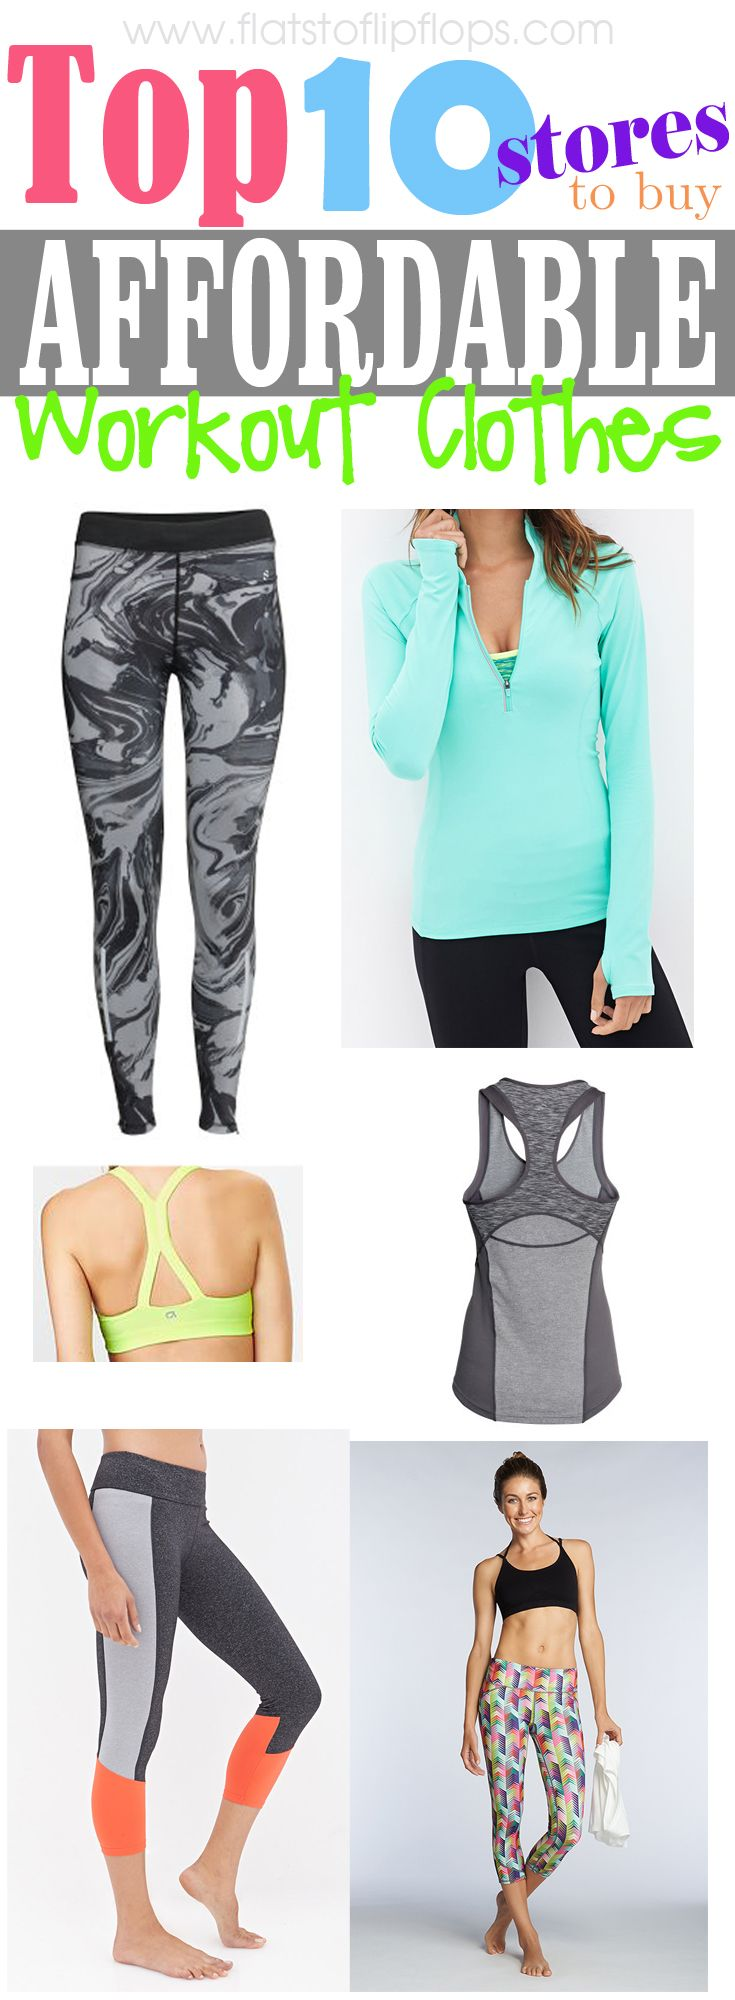 www.flatstoflipflops.com Top 10 Stores for Affordable active wear!